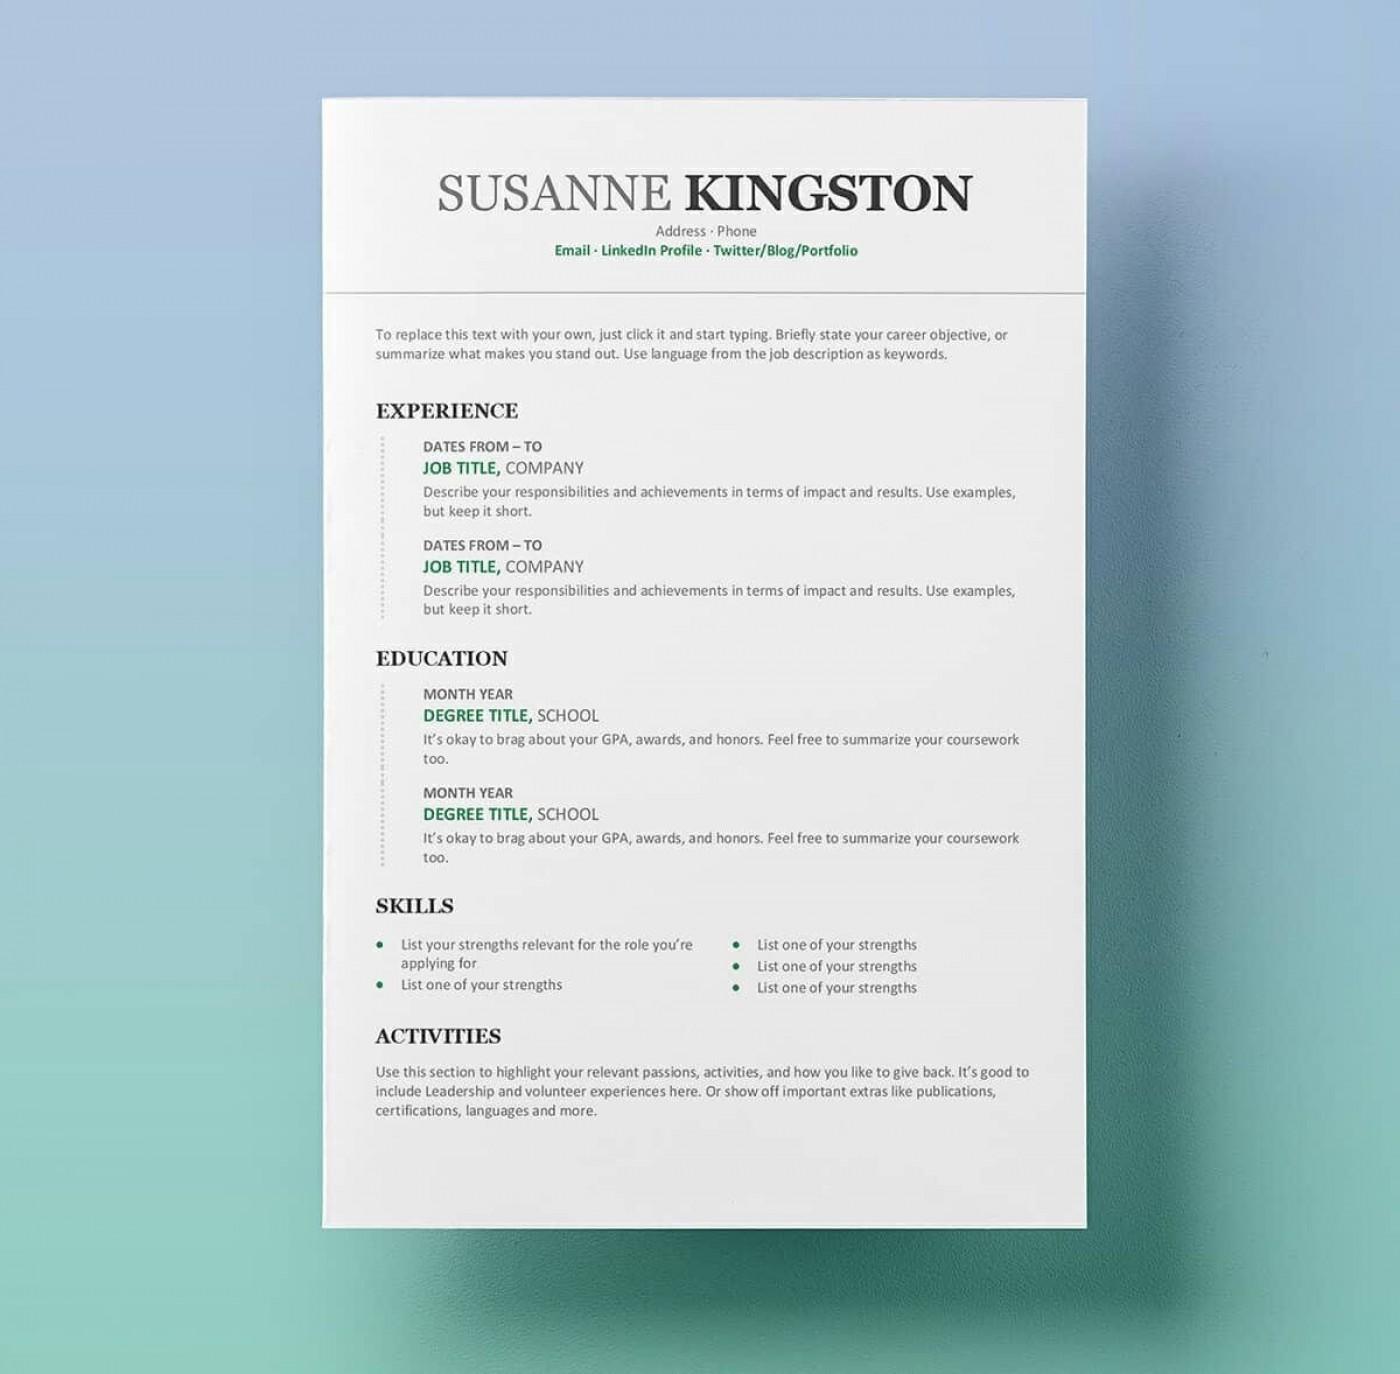 009 Best Free Simple Resume Template Microsoft Word Design 1400